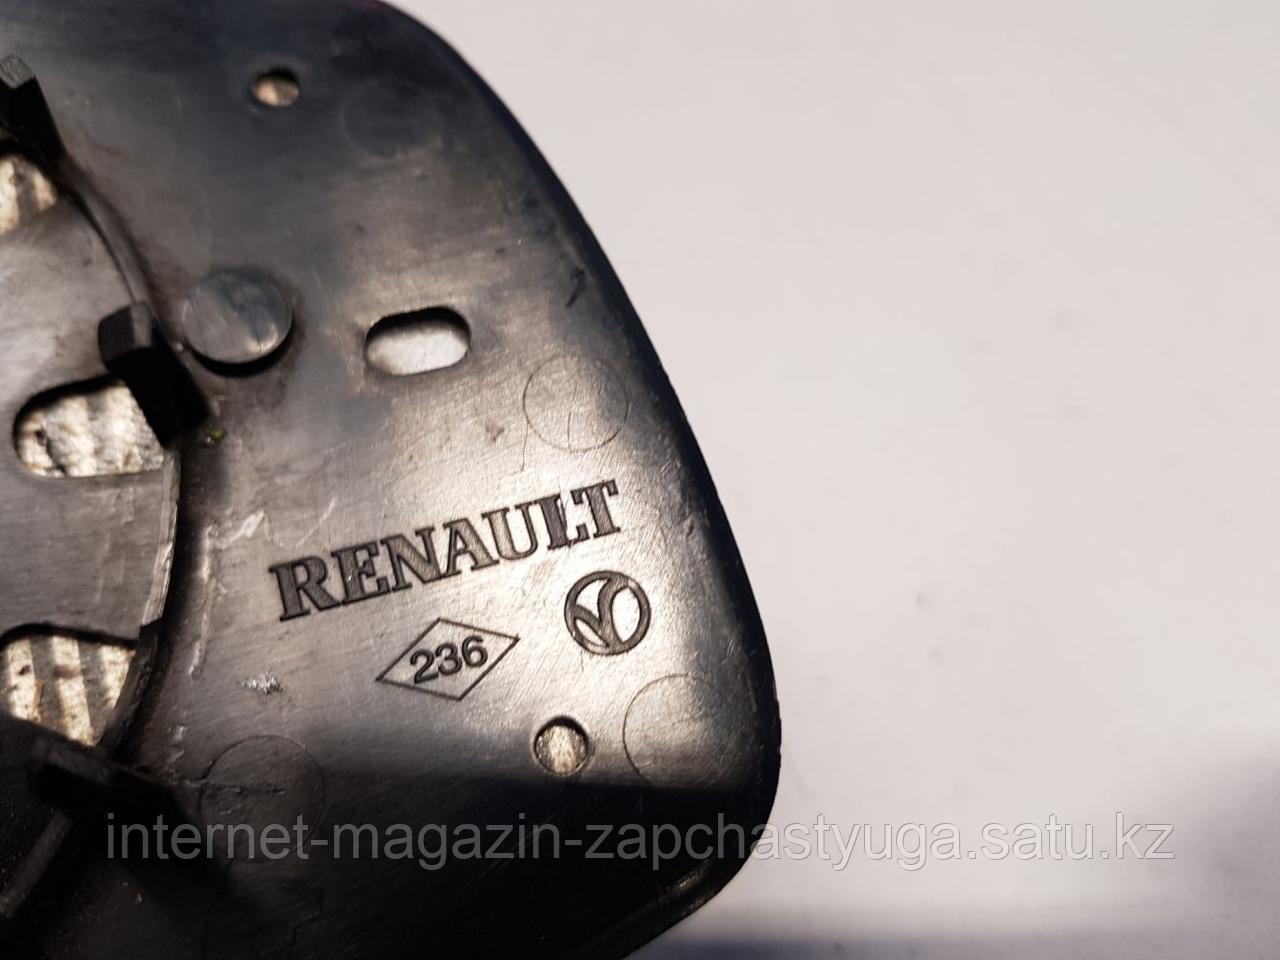 963662807R Зеркальный элемент левый для Renault Megane 3 2009-2016 Б/У - фото 2